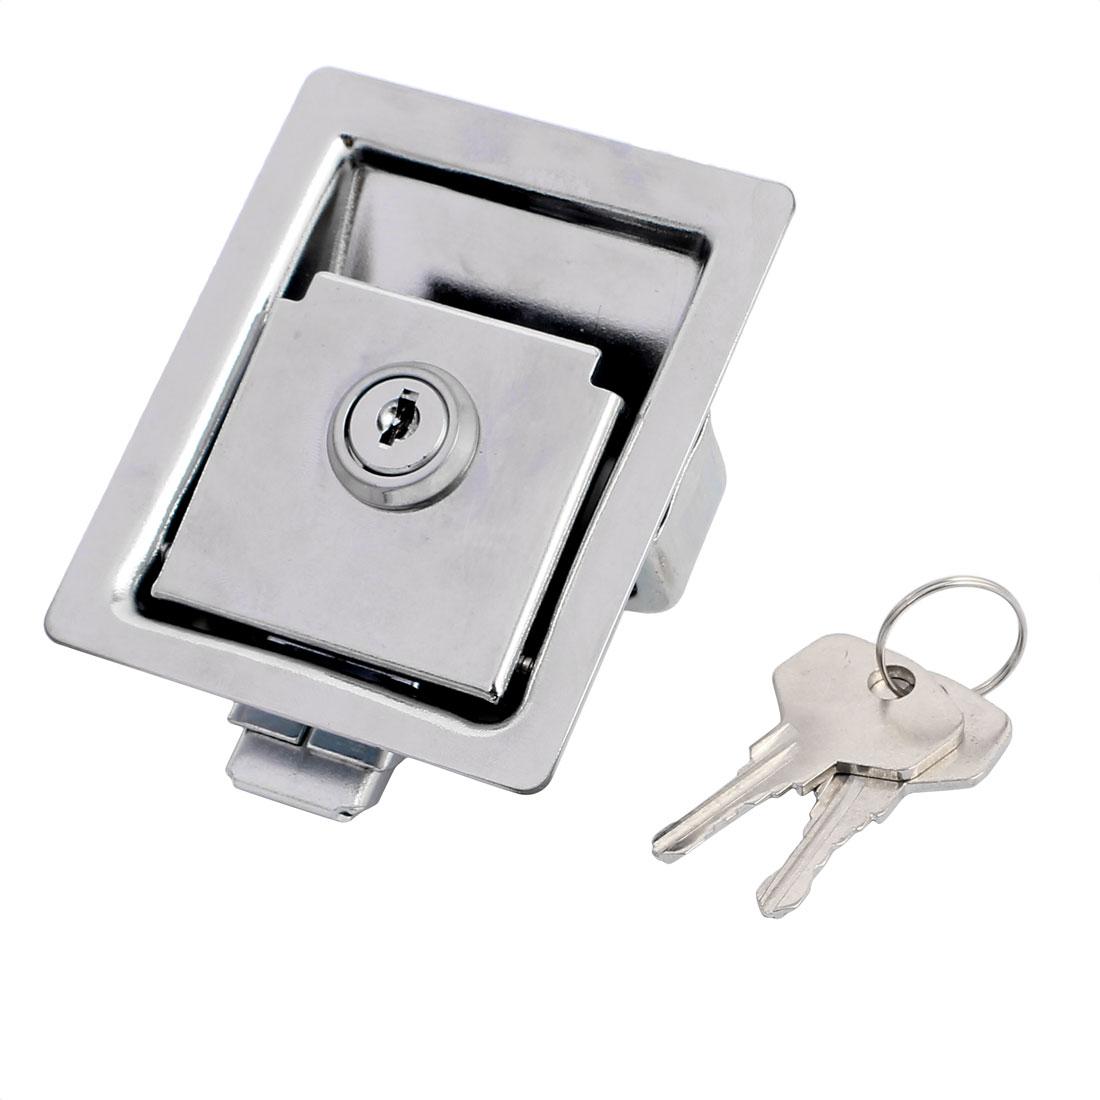 Office Home Chrome Plated Pull Type Slam Latch Lock Locker Silver Tone 90mmx69mm